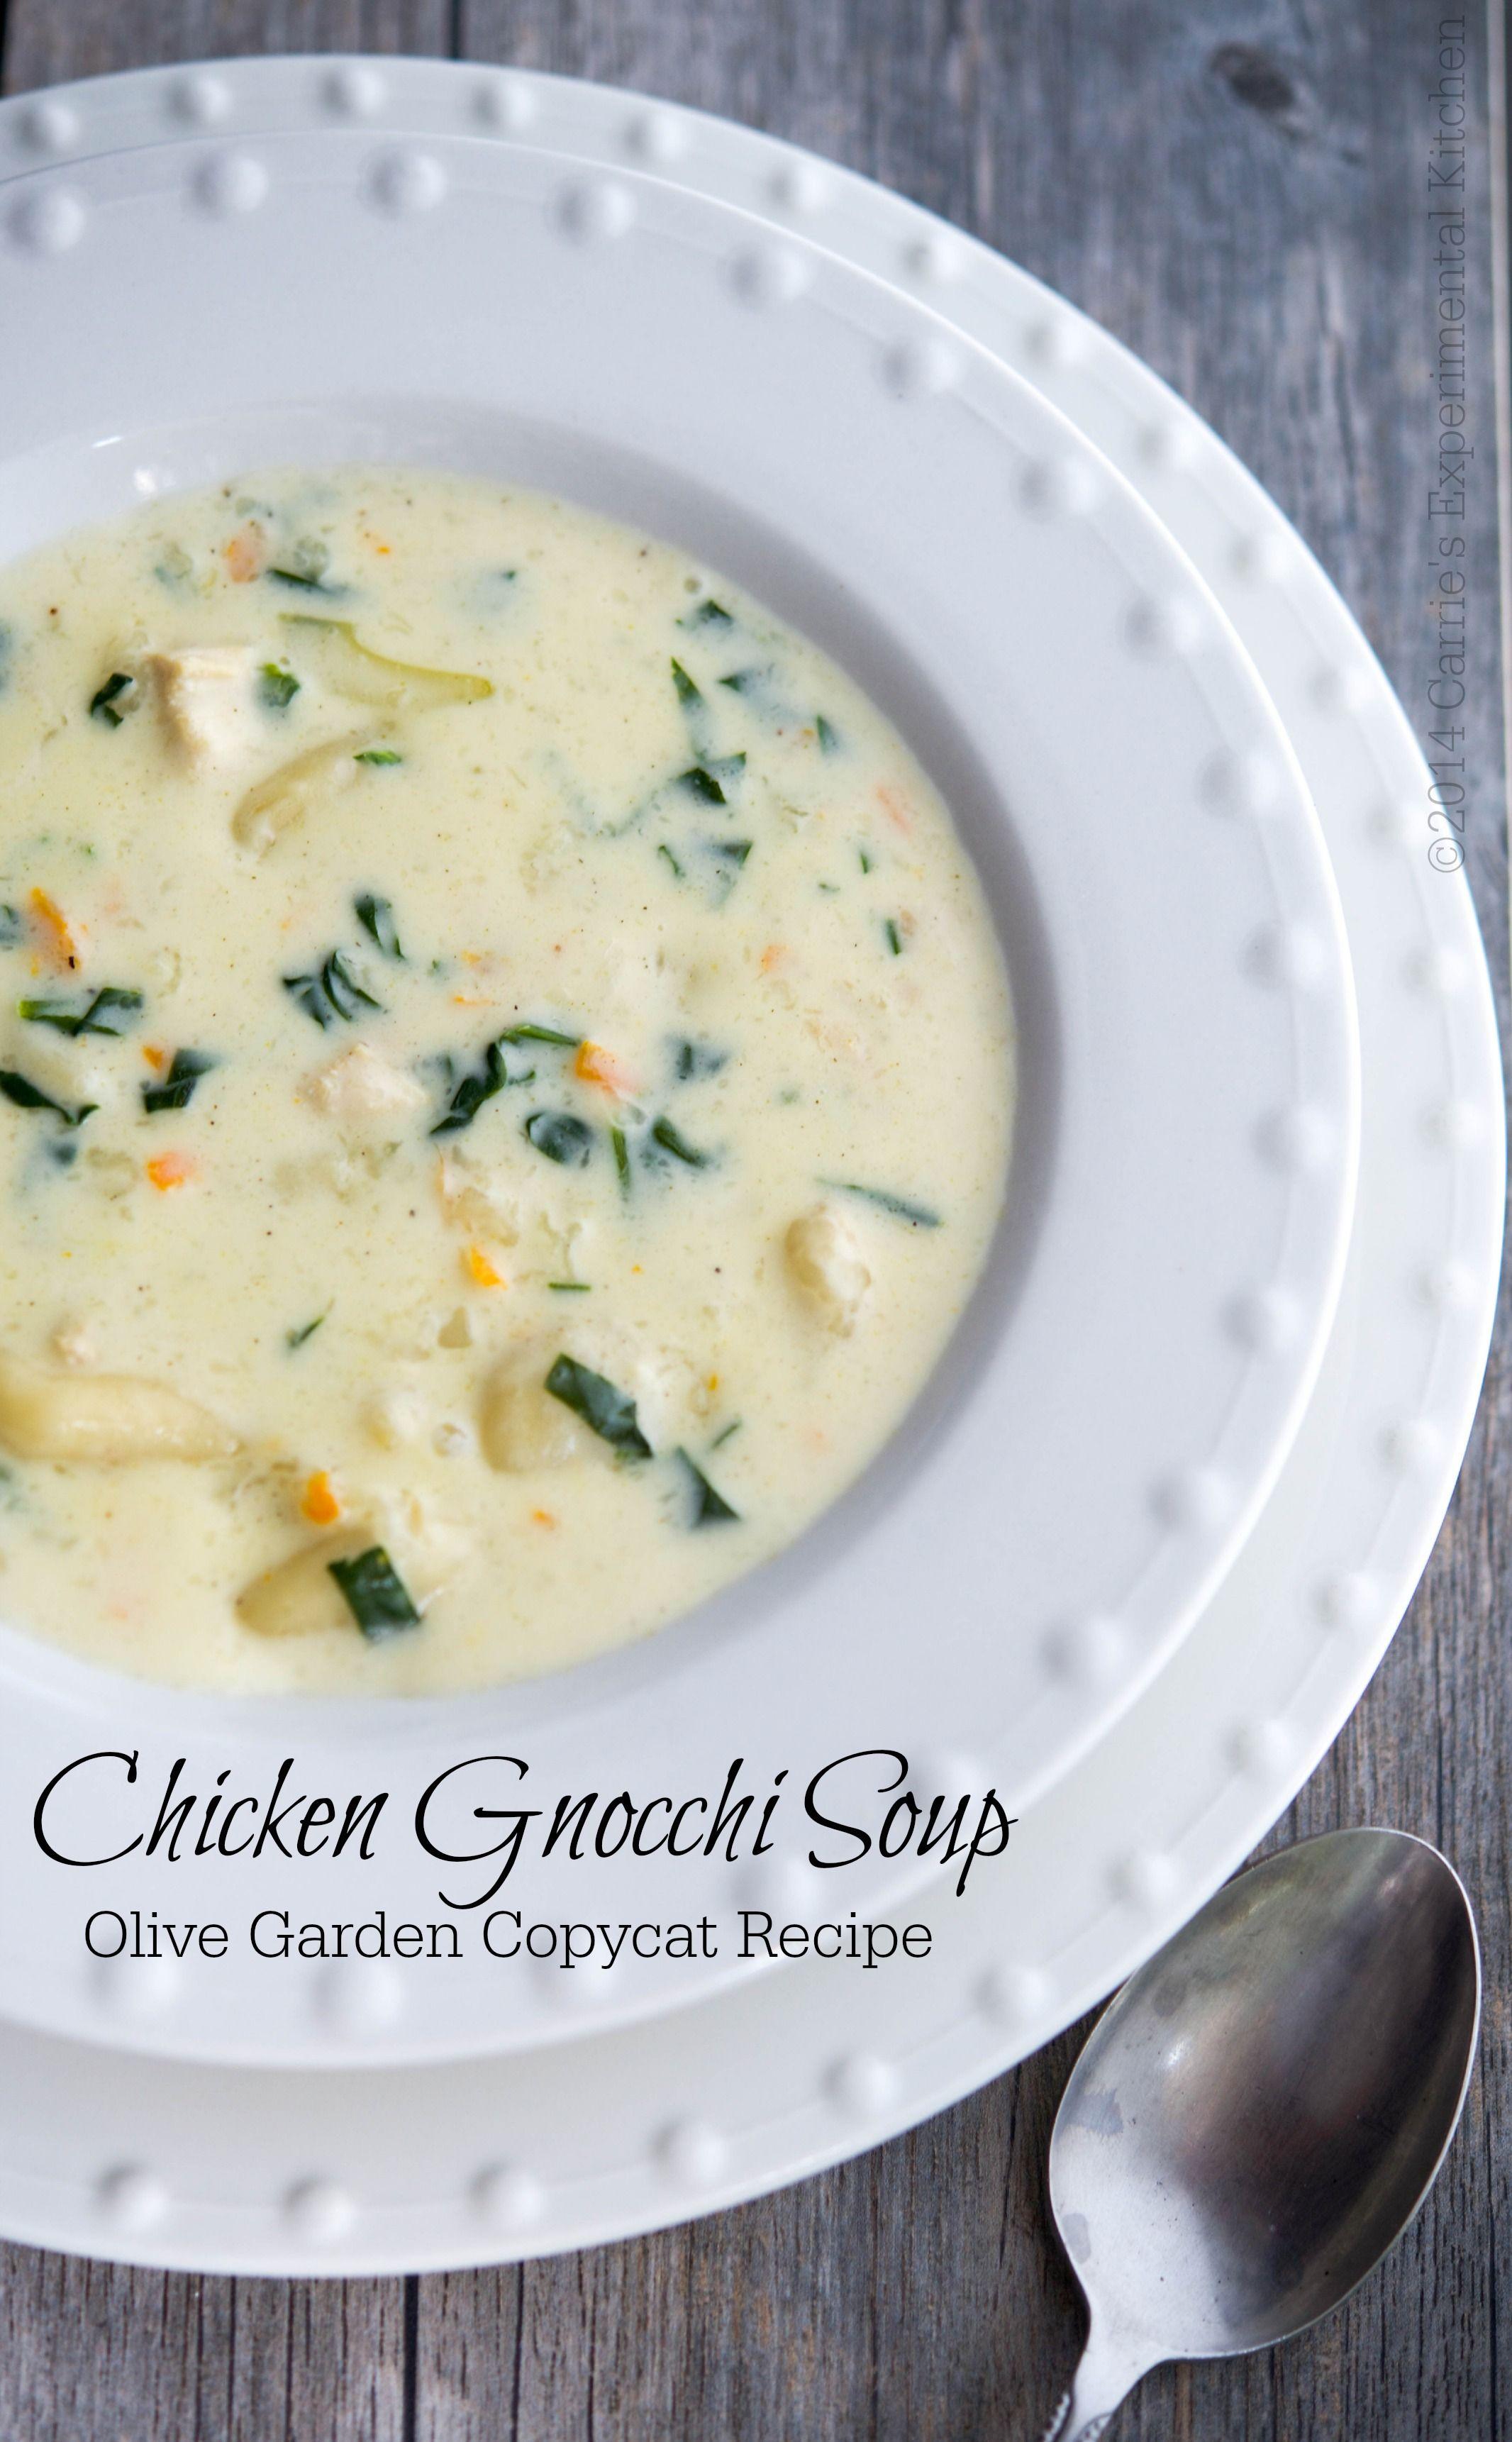 Olive Garden Chicken Gnocchi Soup (Copycat) Recipe